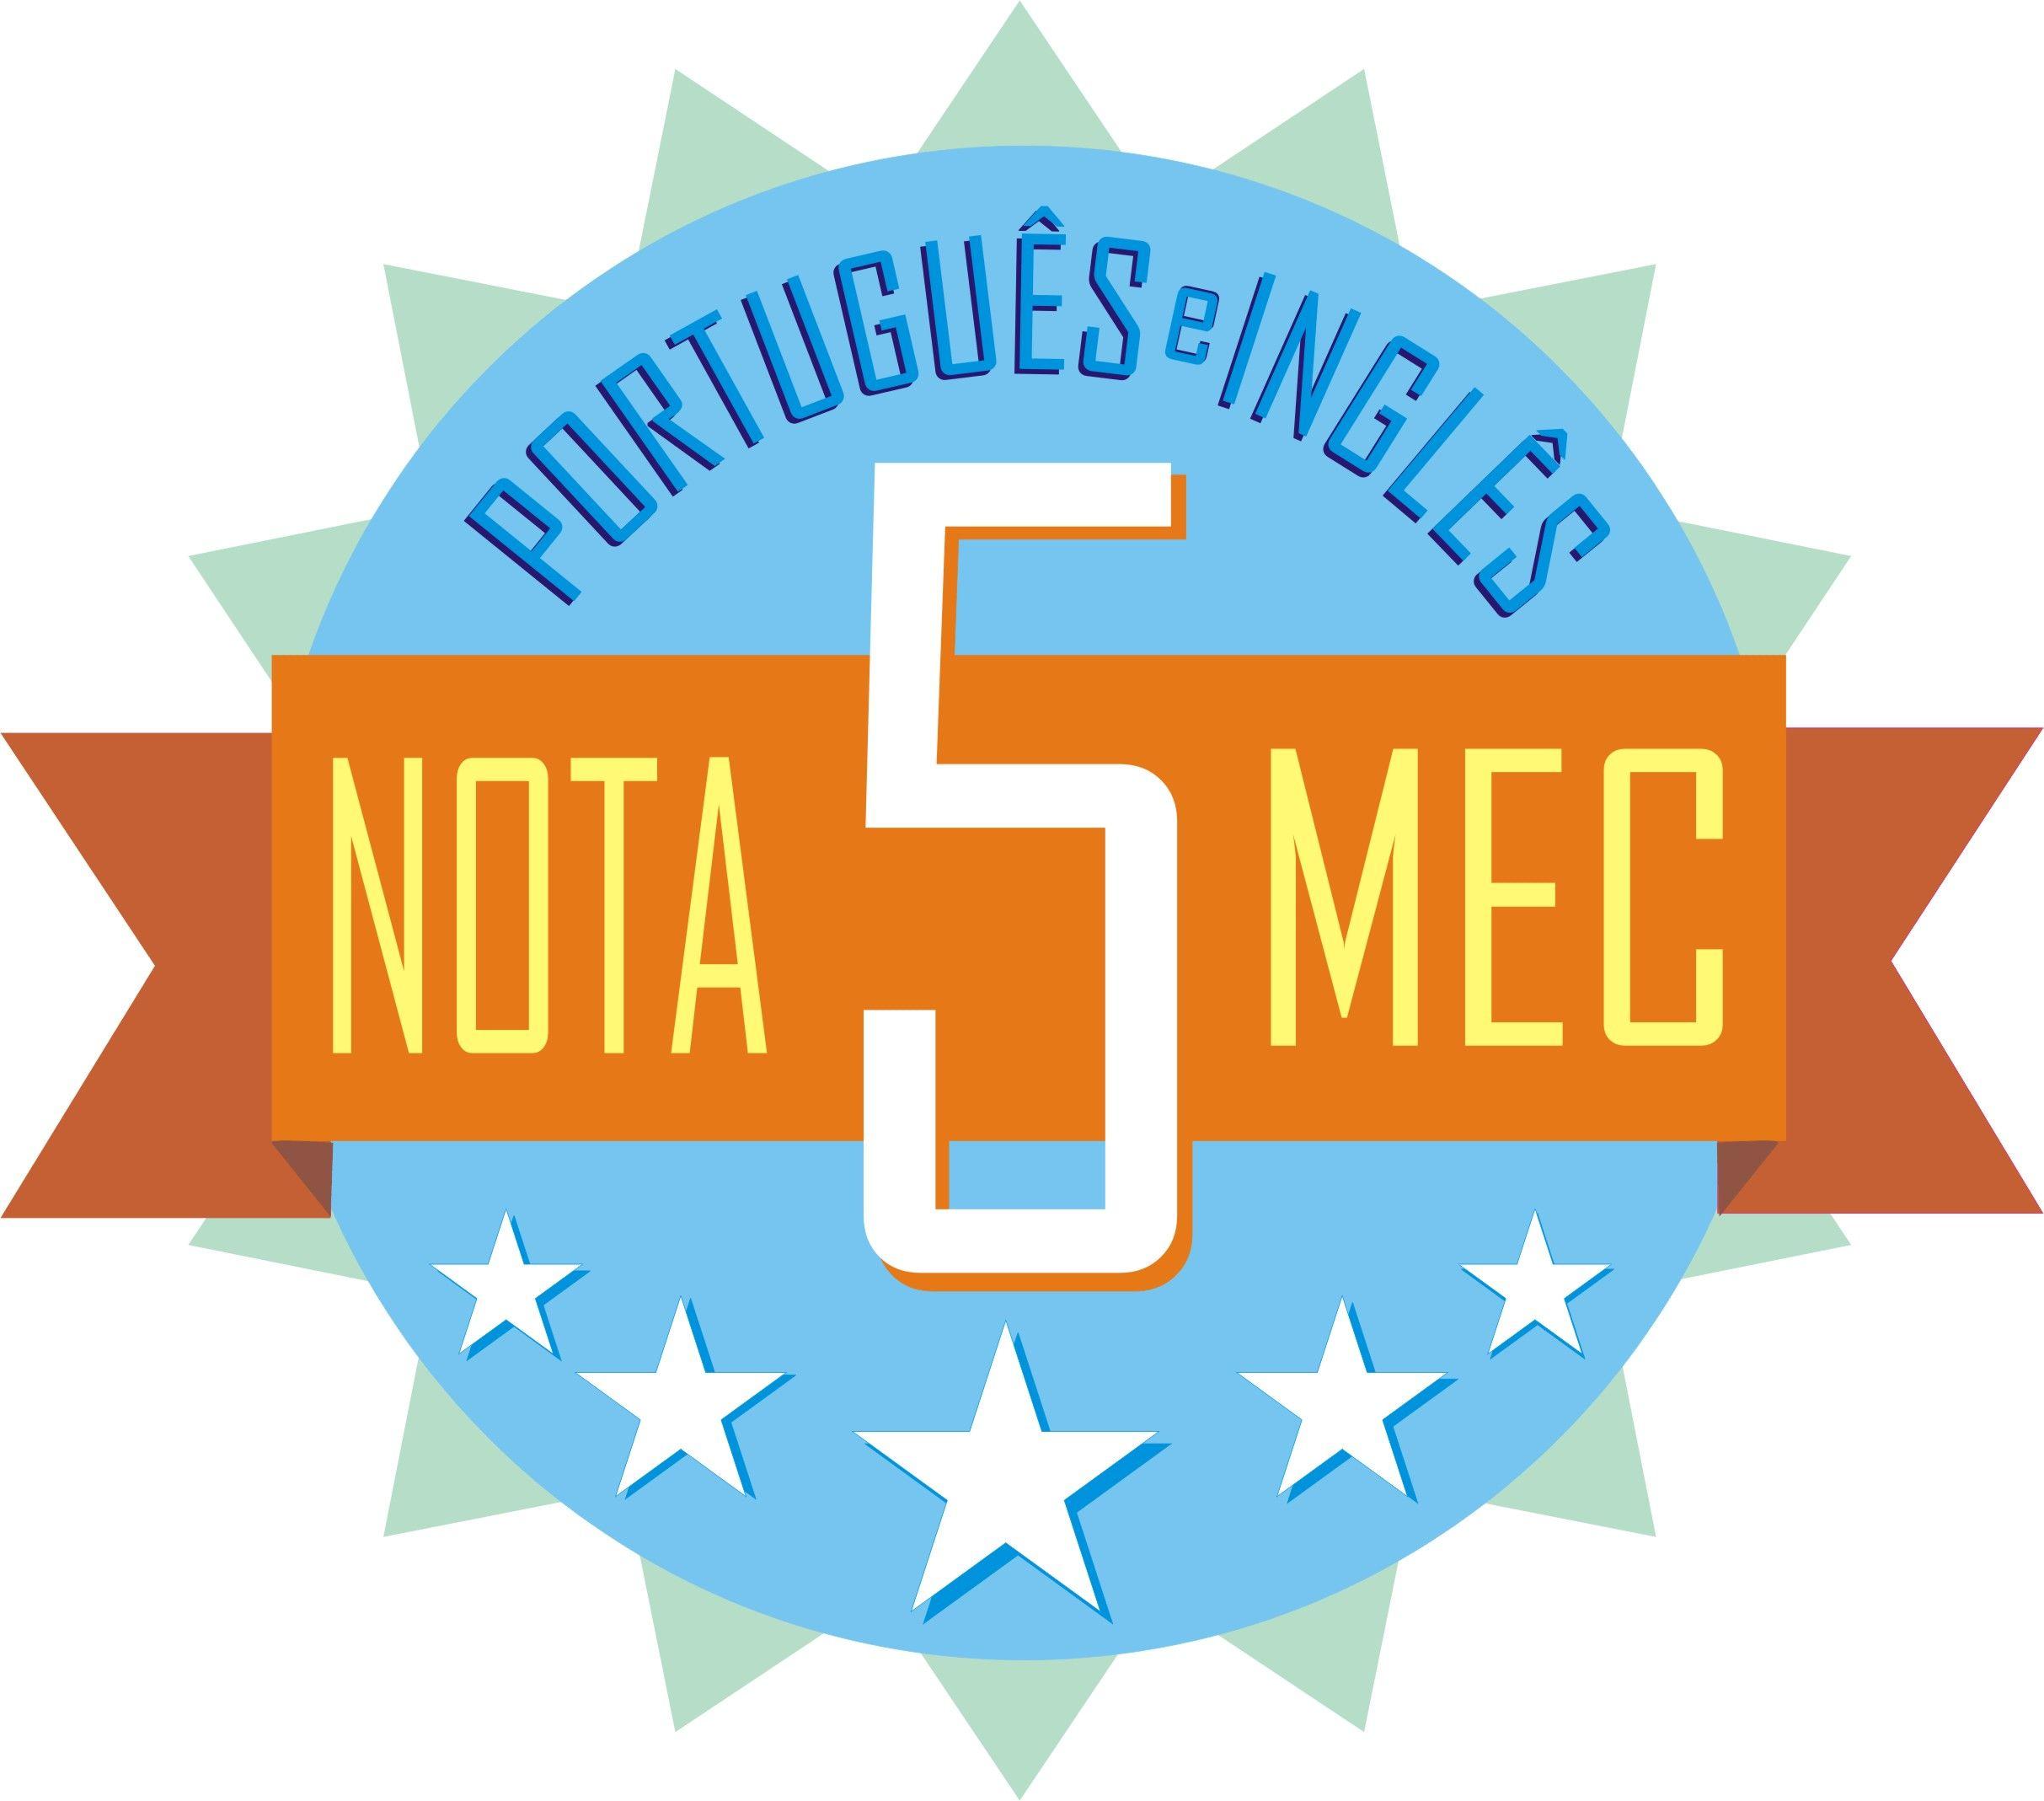 Nota 5 MEC